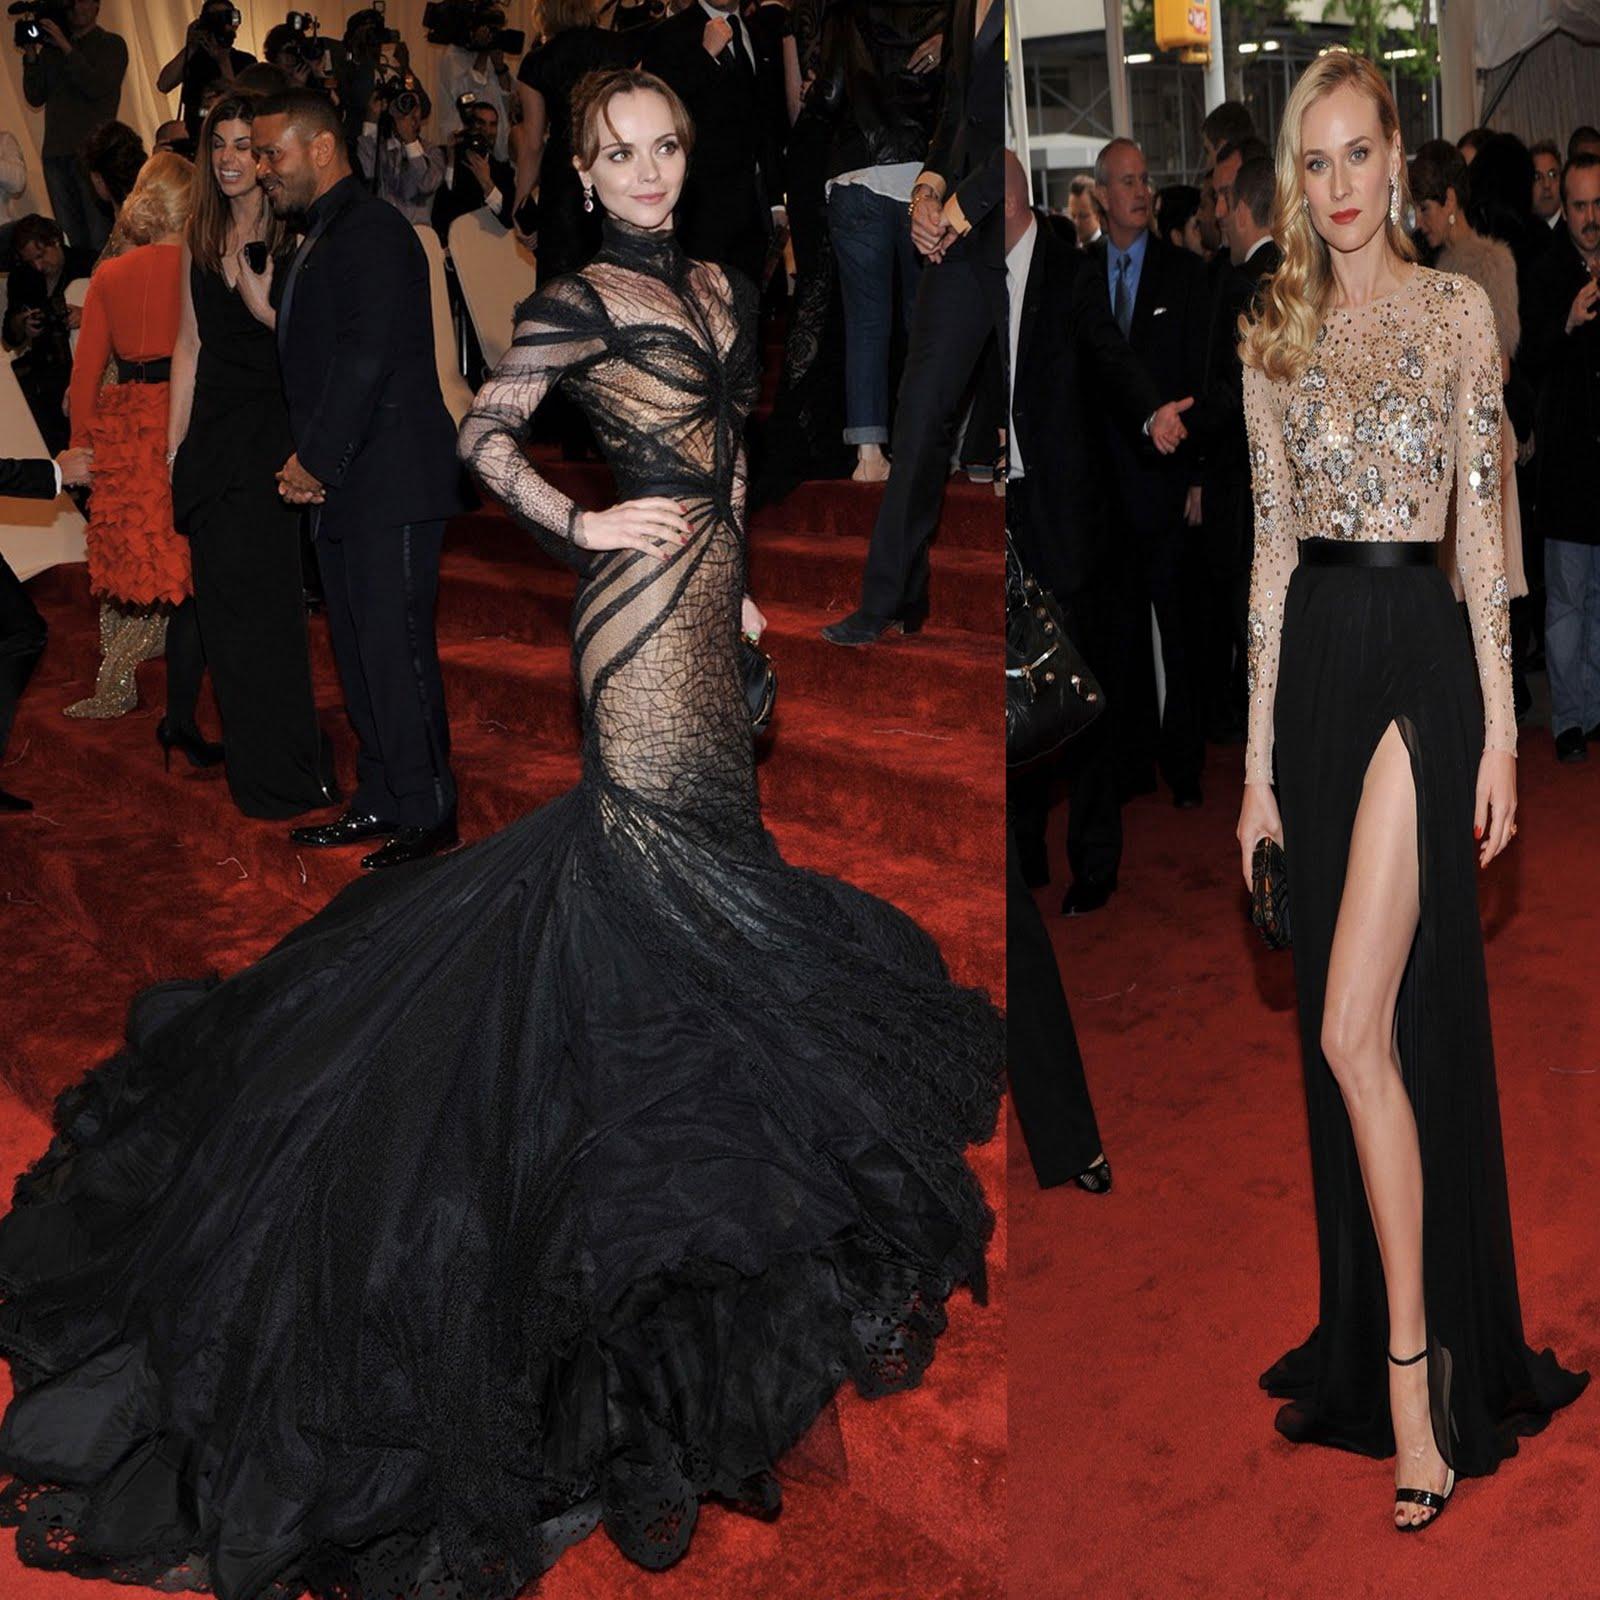 http://1.bp.blogspot.com/--3nxxknpzOk/TcB7HWOCSRI/AAAAAAAAD8U/gNoB7RQM5tA/s1600/2011+Met+Ball--jadore-fashion.jpg